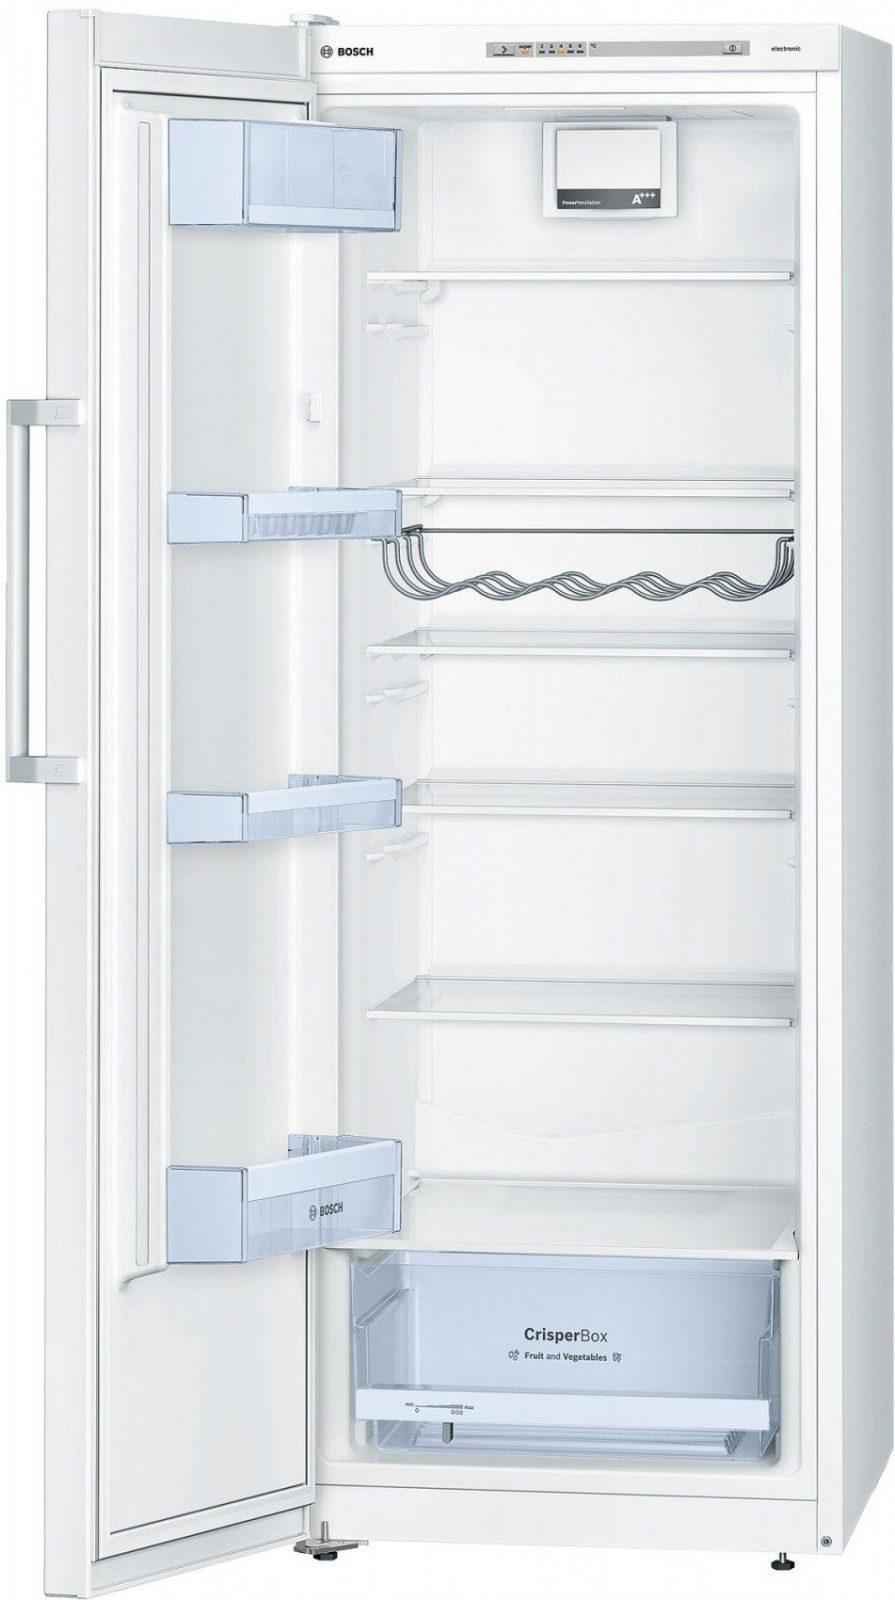 Bosch Ksv29Vw40 Classic A+++ Kühlschrank Weiß 60 Cm Breit Von von Kühlschrank 100 Cm Breit Photo